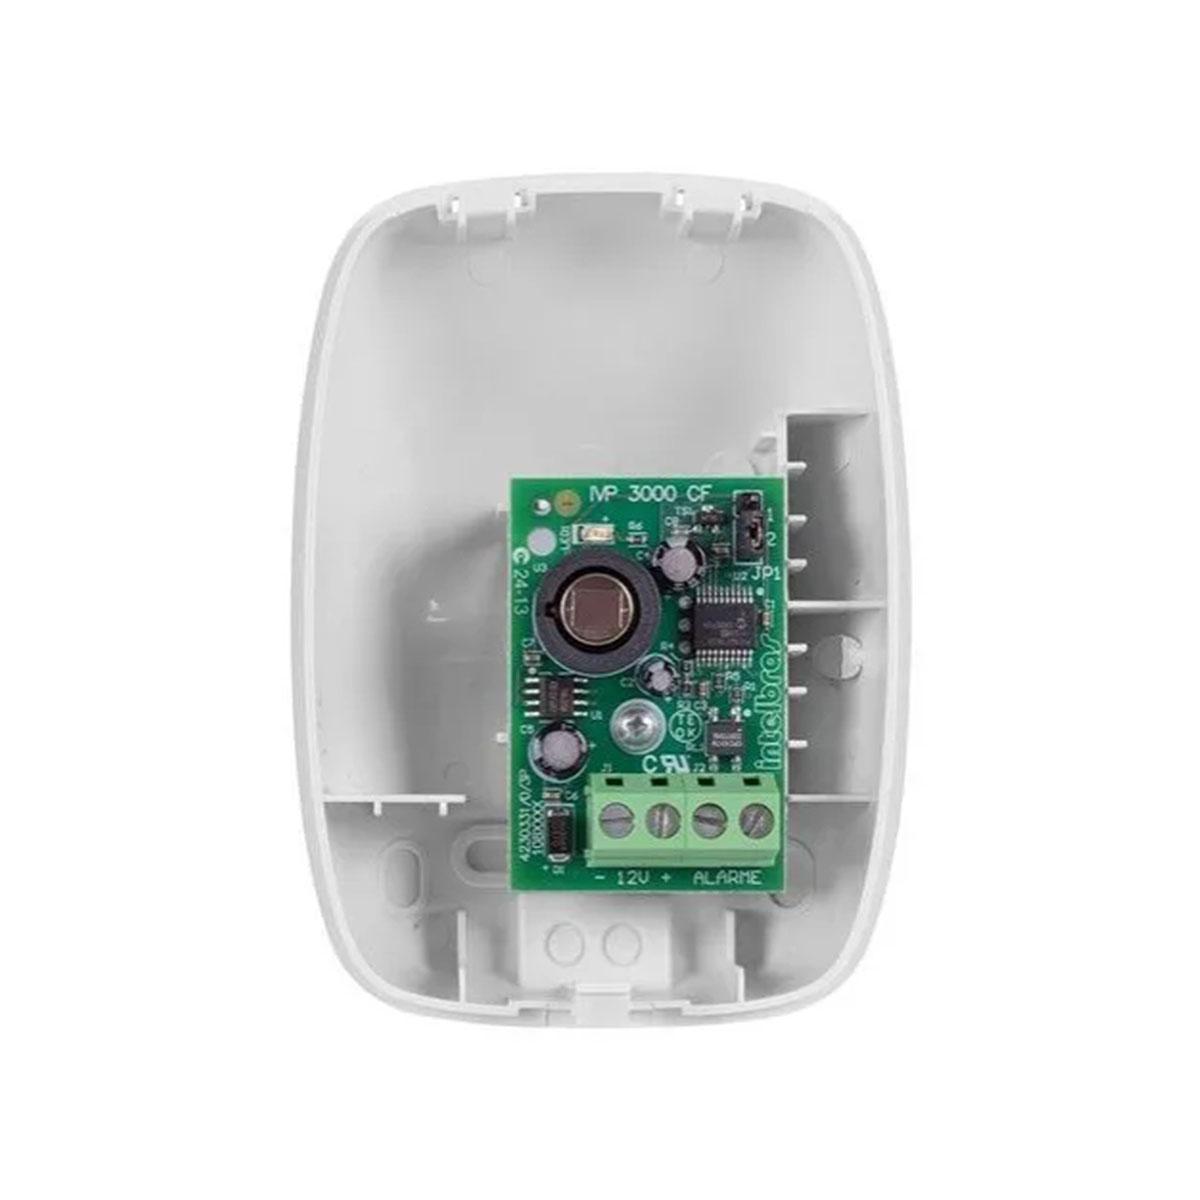 Kit 02 Sensor Interno Com Fio Intelbras Ivp 3000 Cf